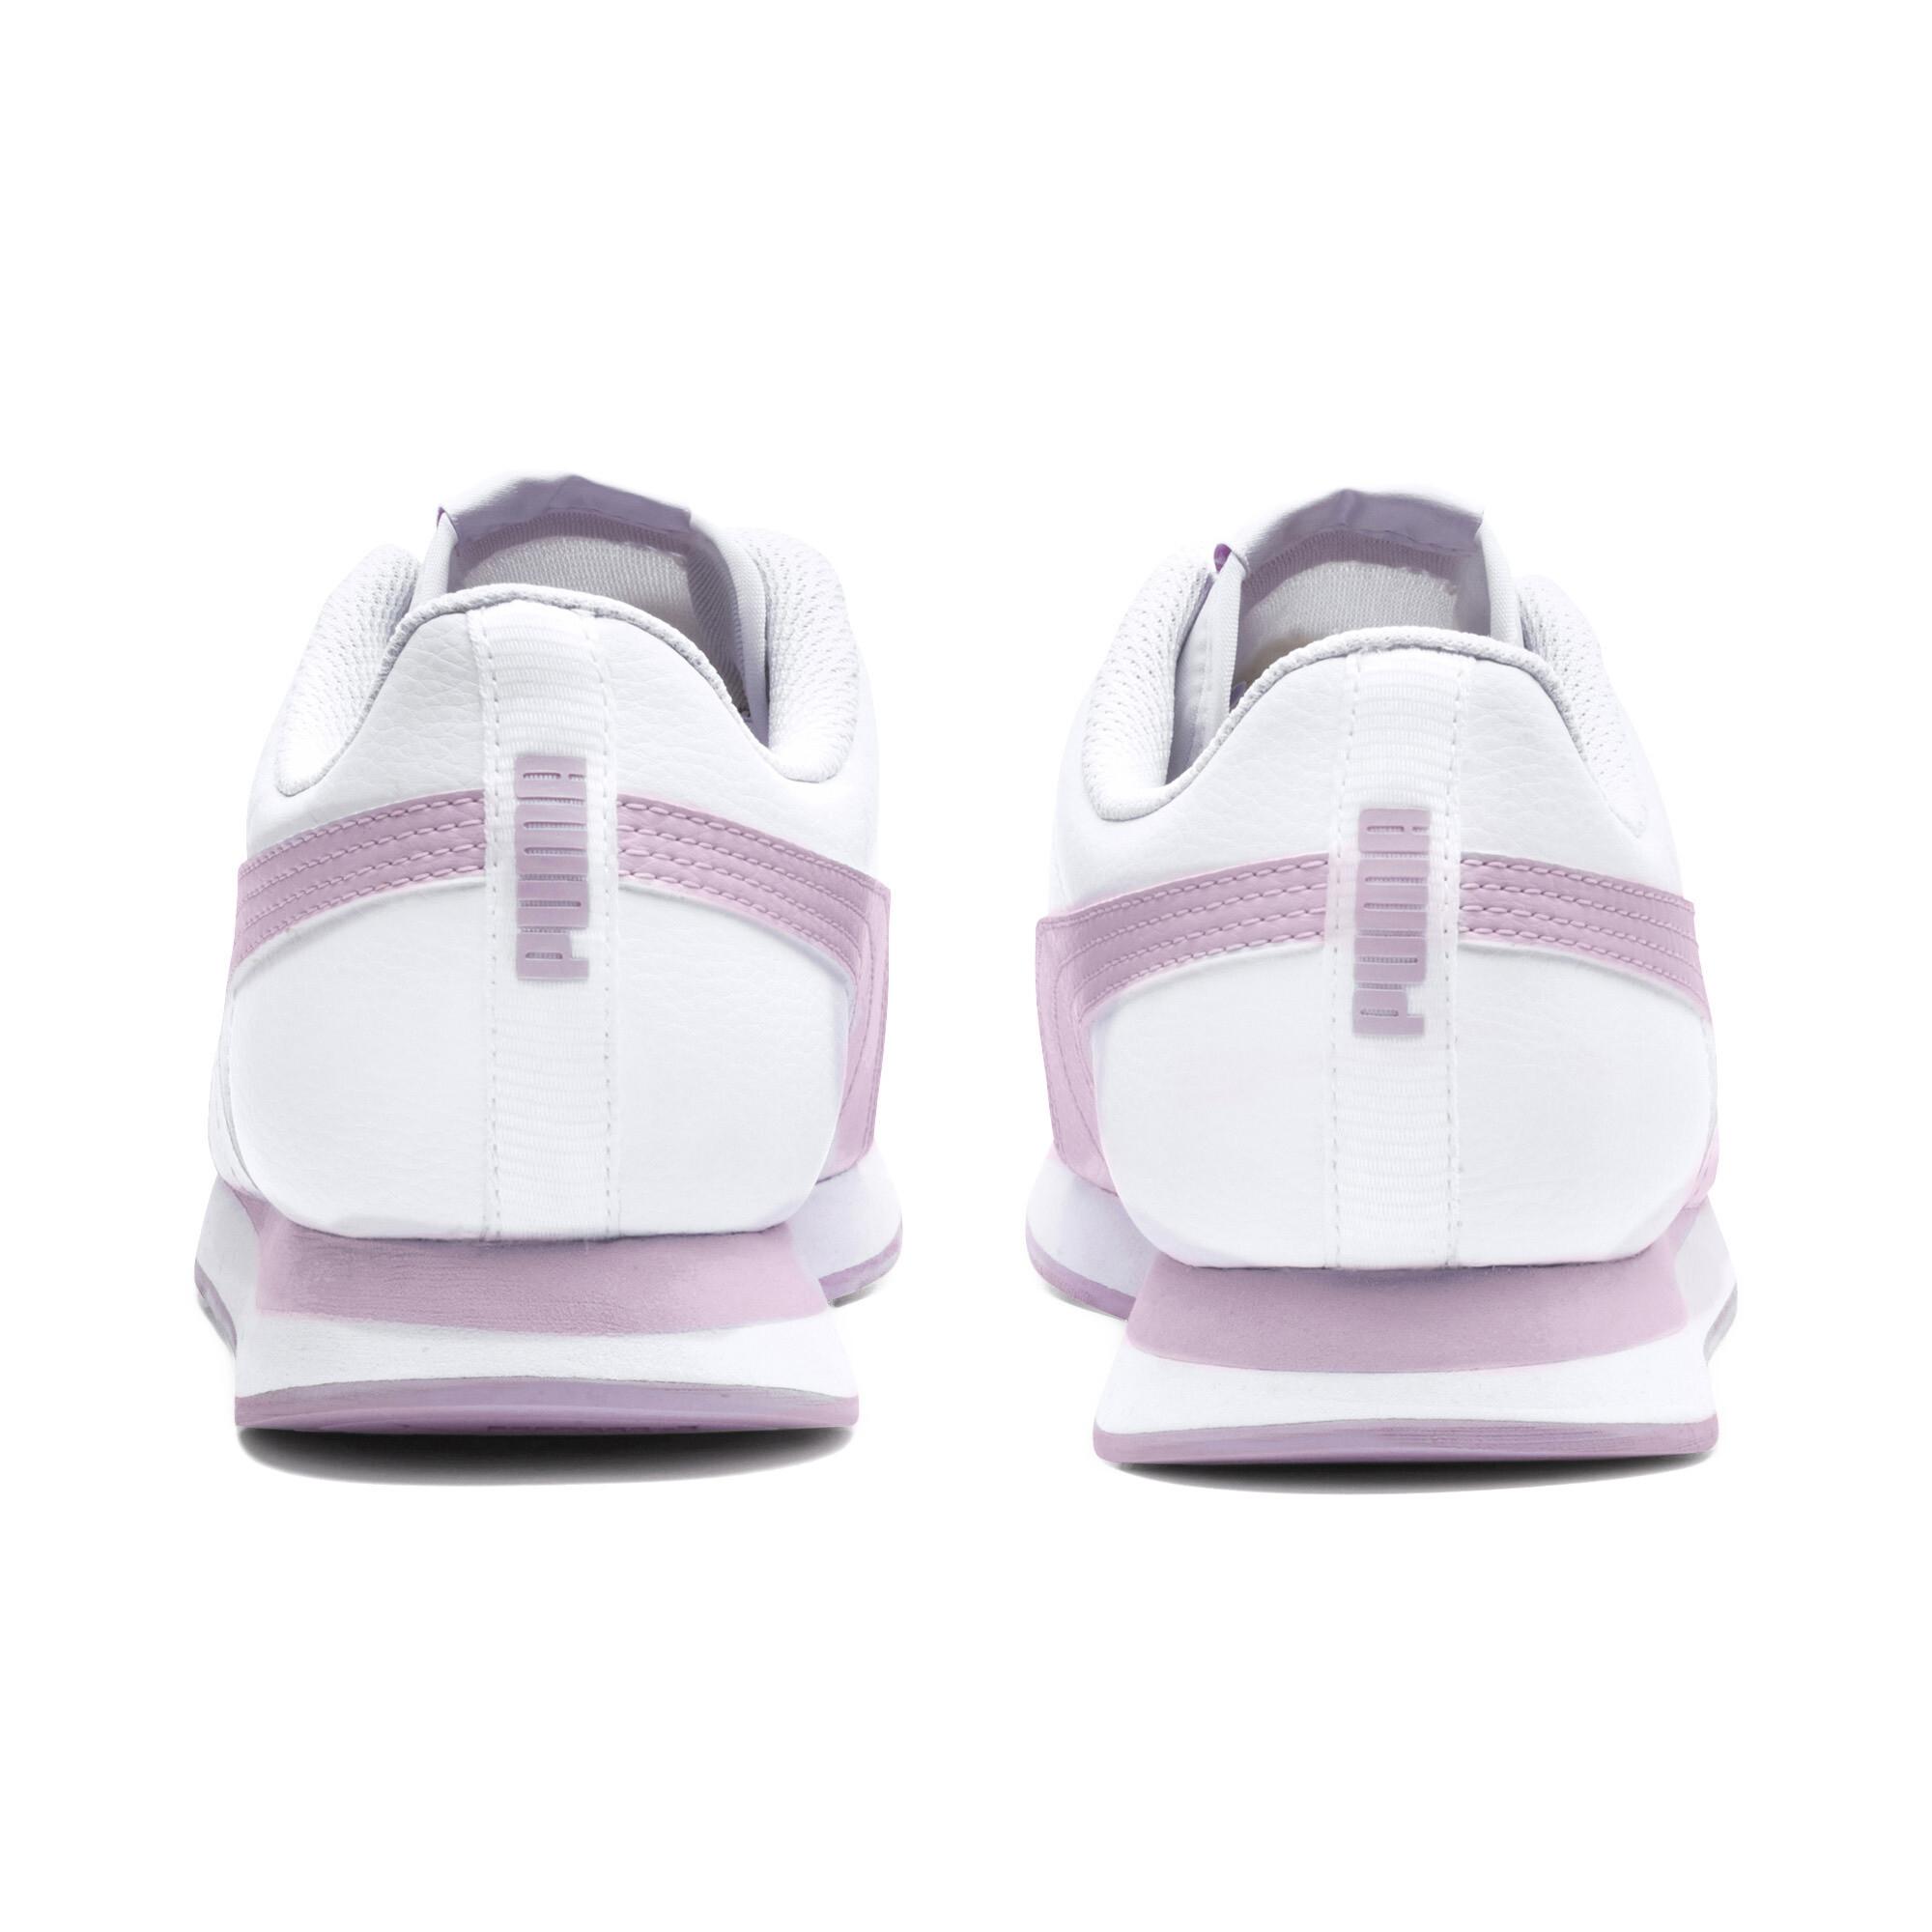 PUMA-Men-039-s-Turin-II-Sneakers thumbnail 20